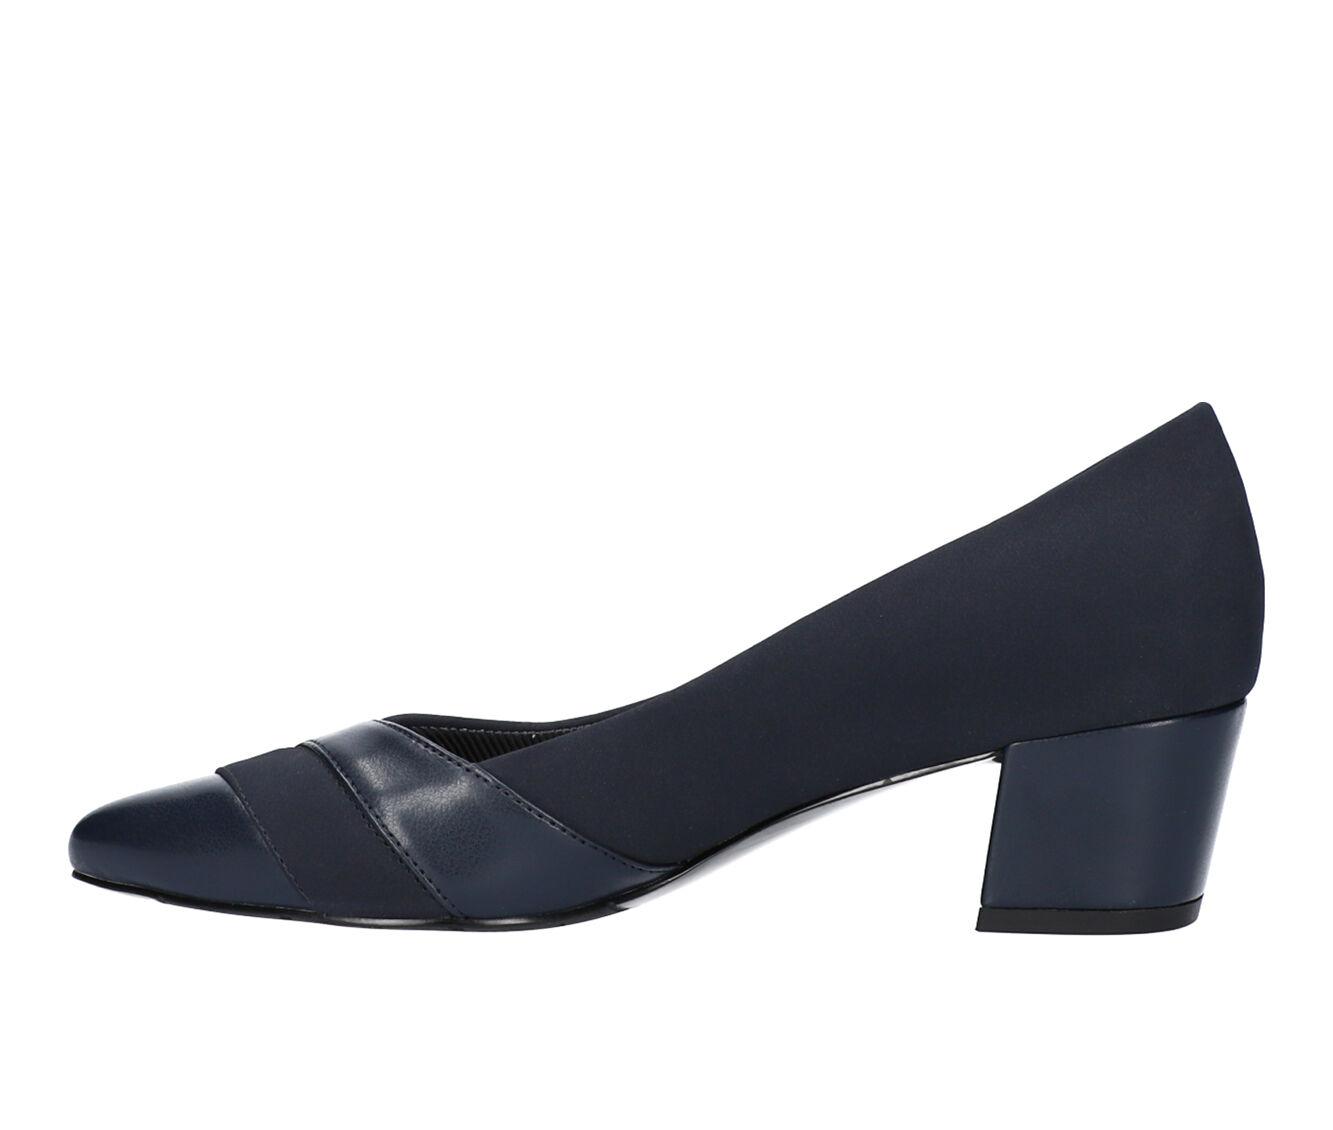 Women's Easy Street Elle Pumps   Women's shoes   2020 New aRsDs